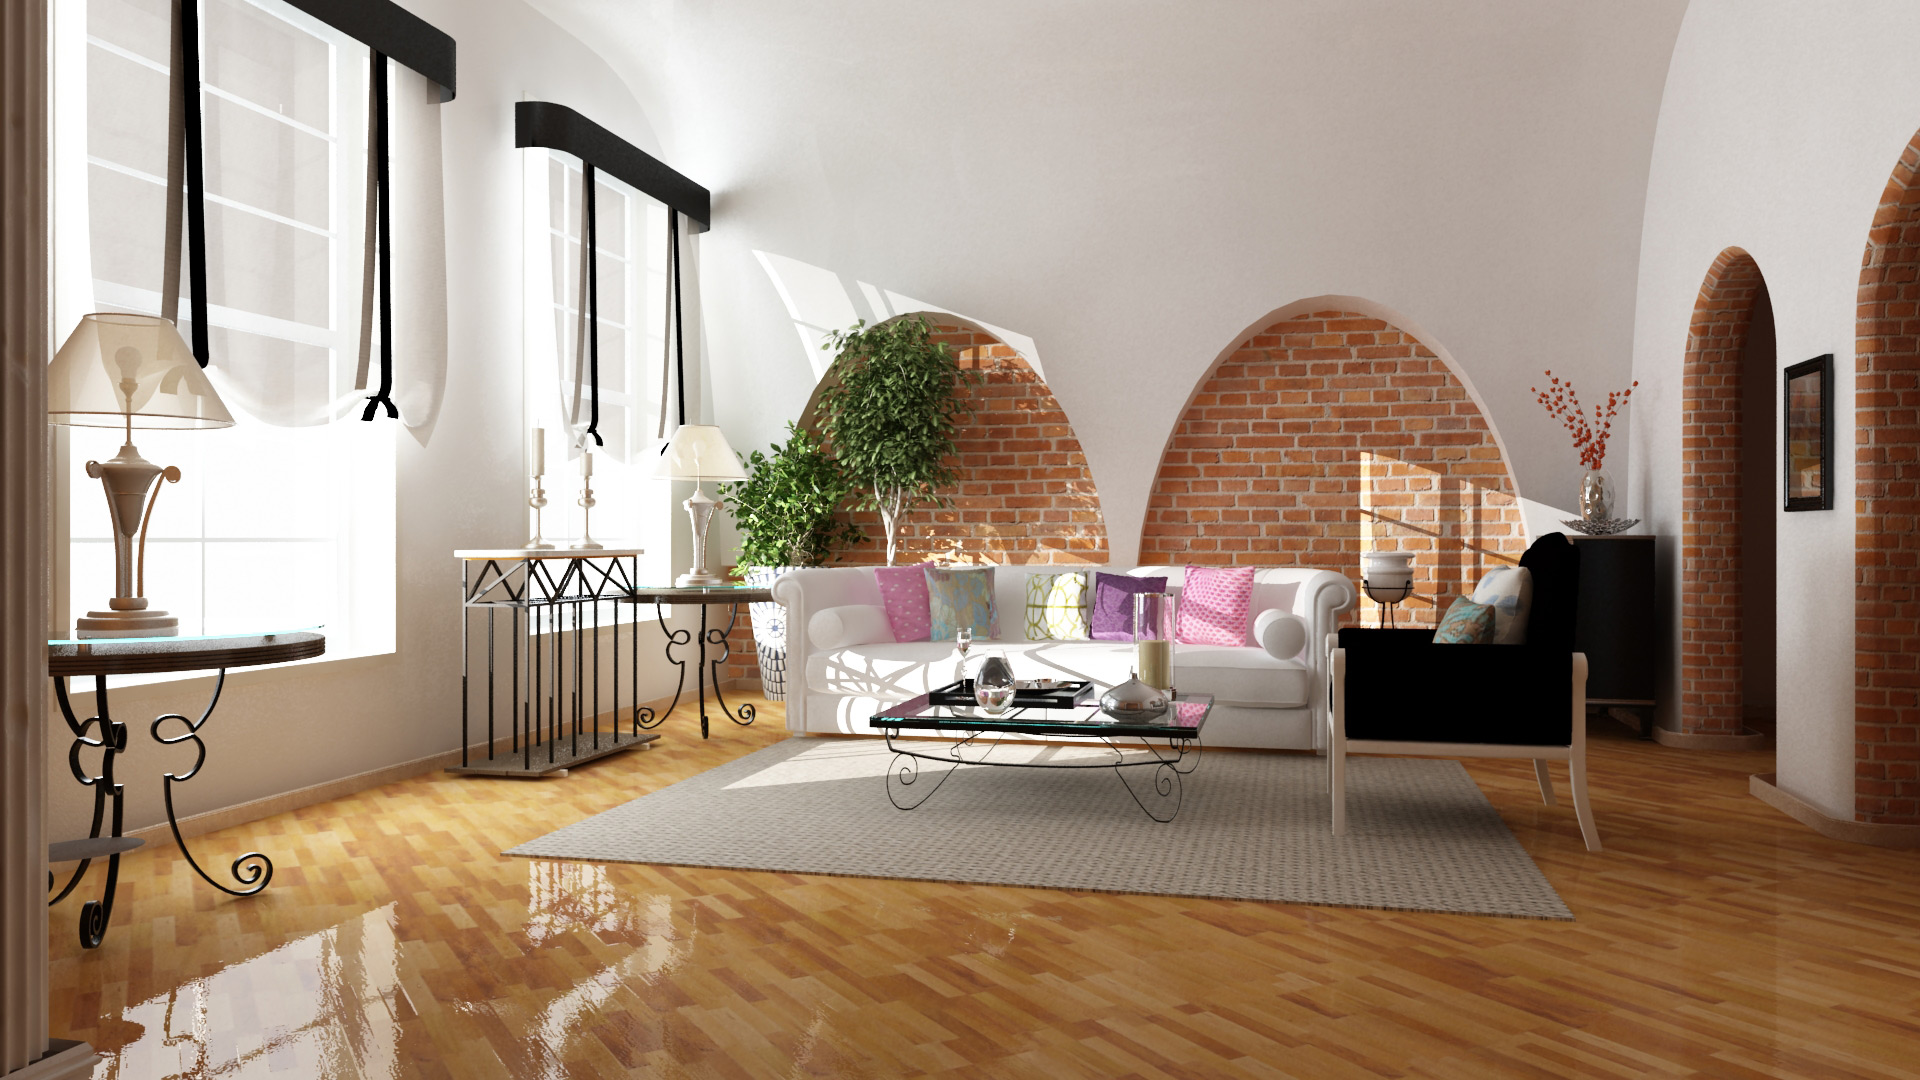 Living Room Design And Rendering 15 Luglio 2012